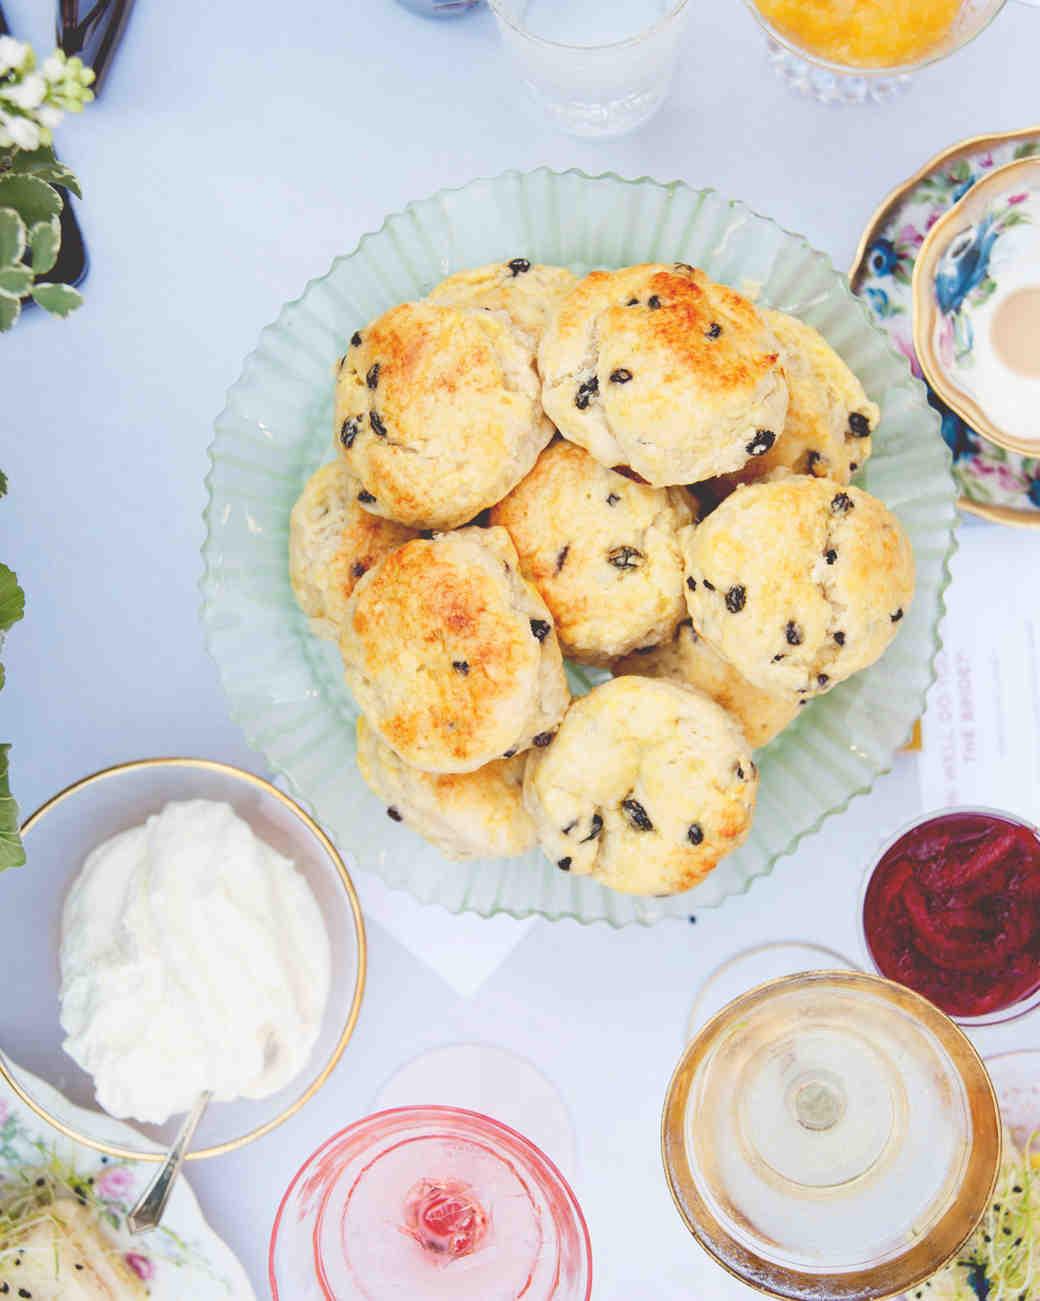 claire-thomas-bridal-shower-tea-scones-0215.jpg